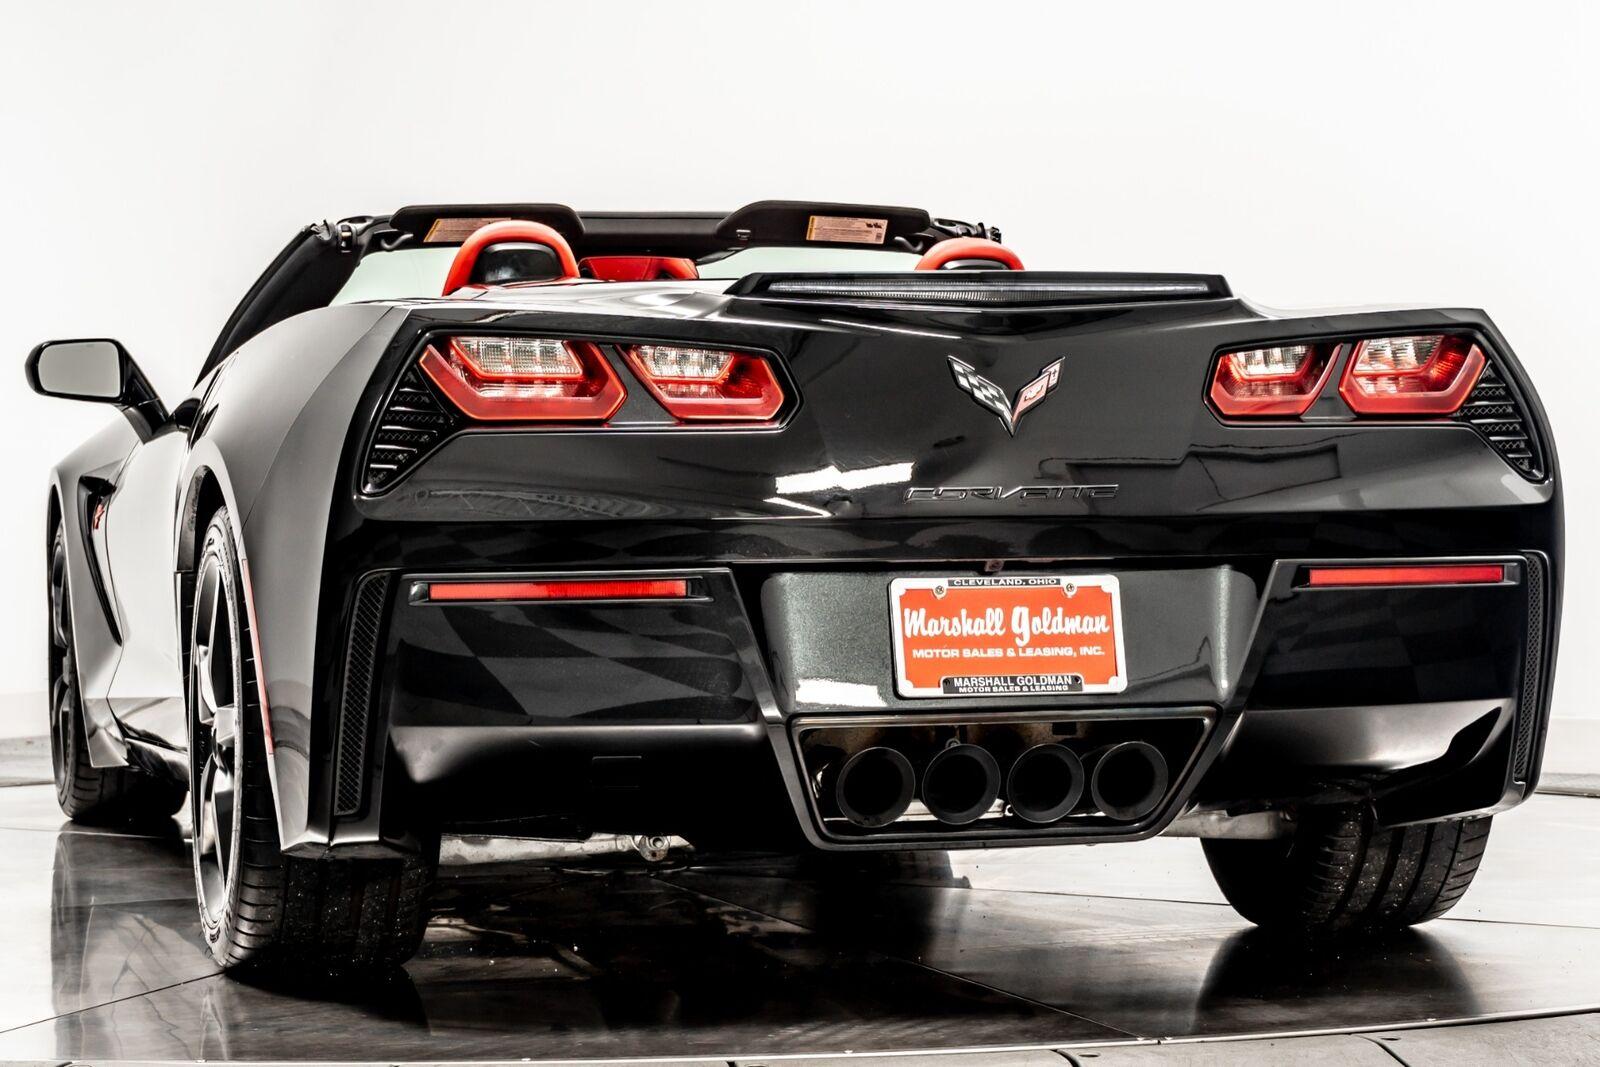 2014 Black Chevrolet Corvette Convertible 2LT   C7 Corvette Photo 6